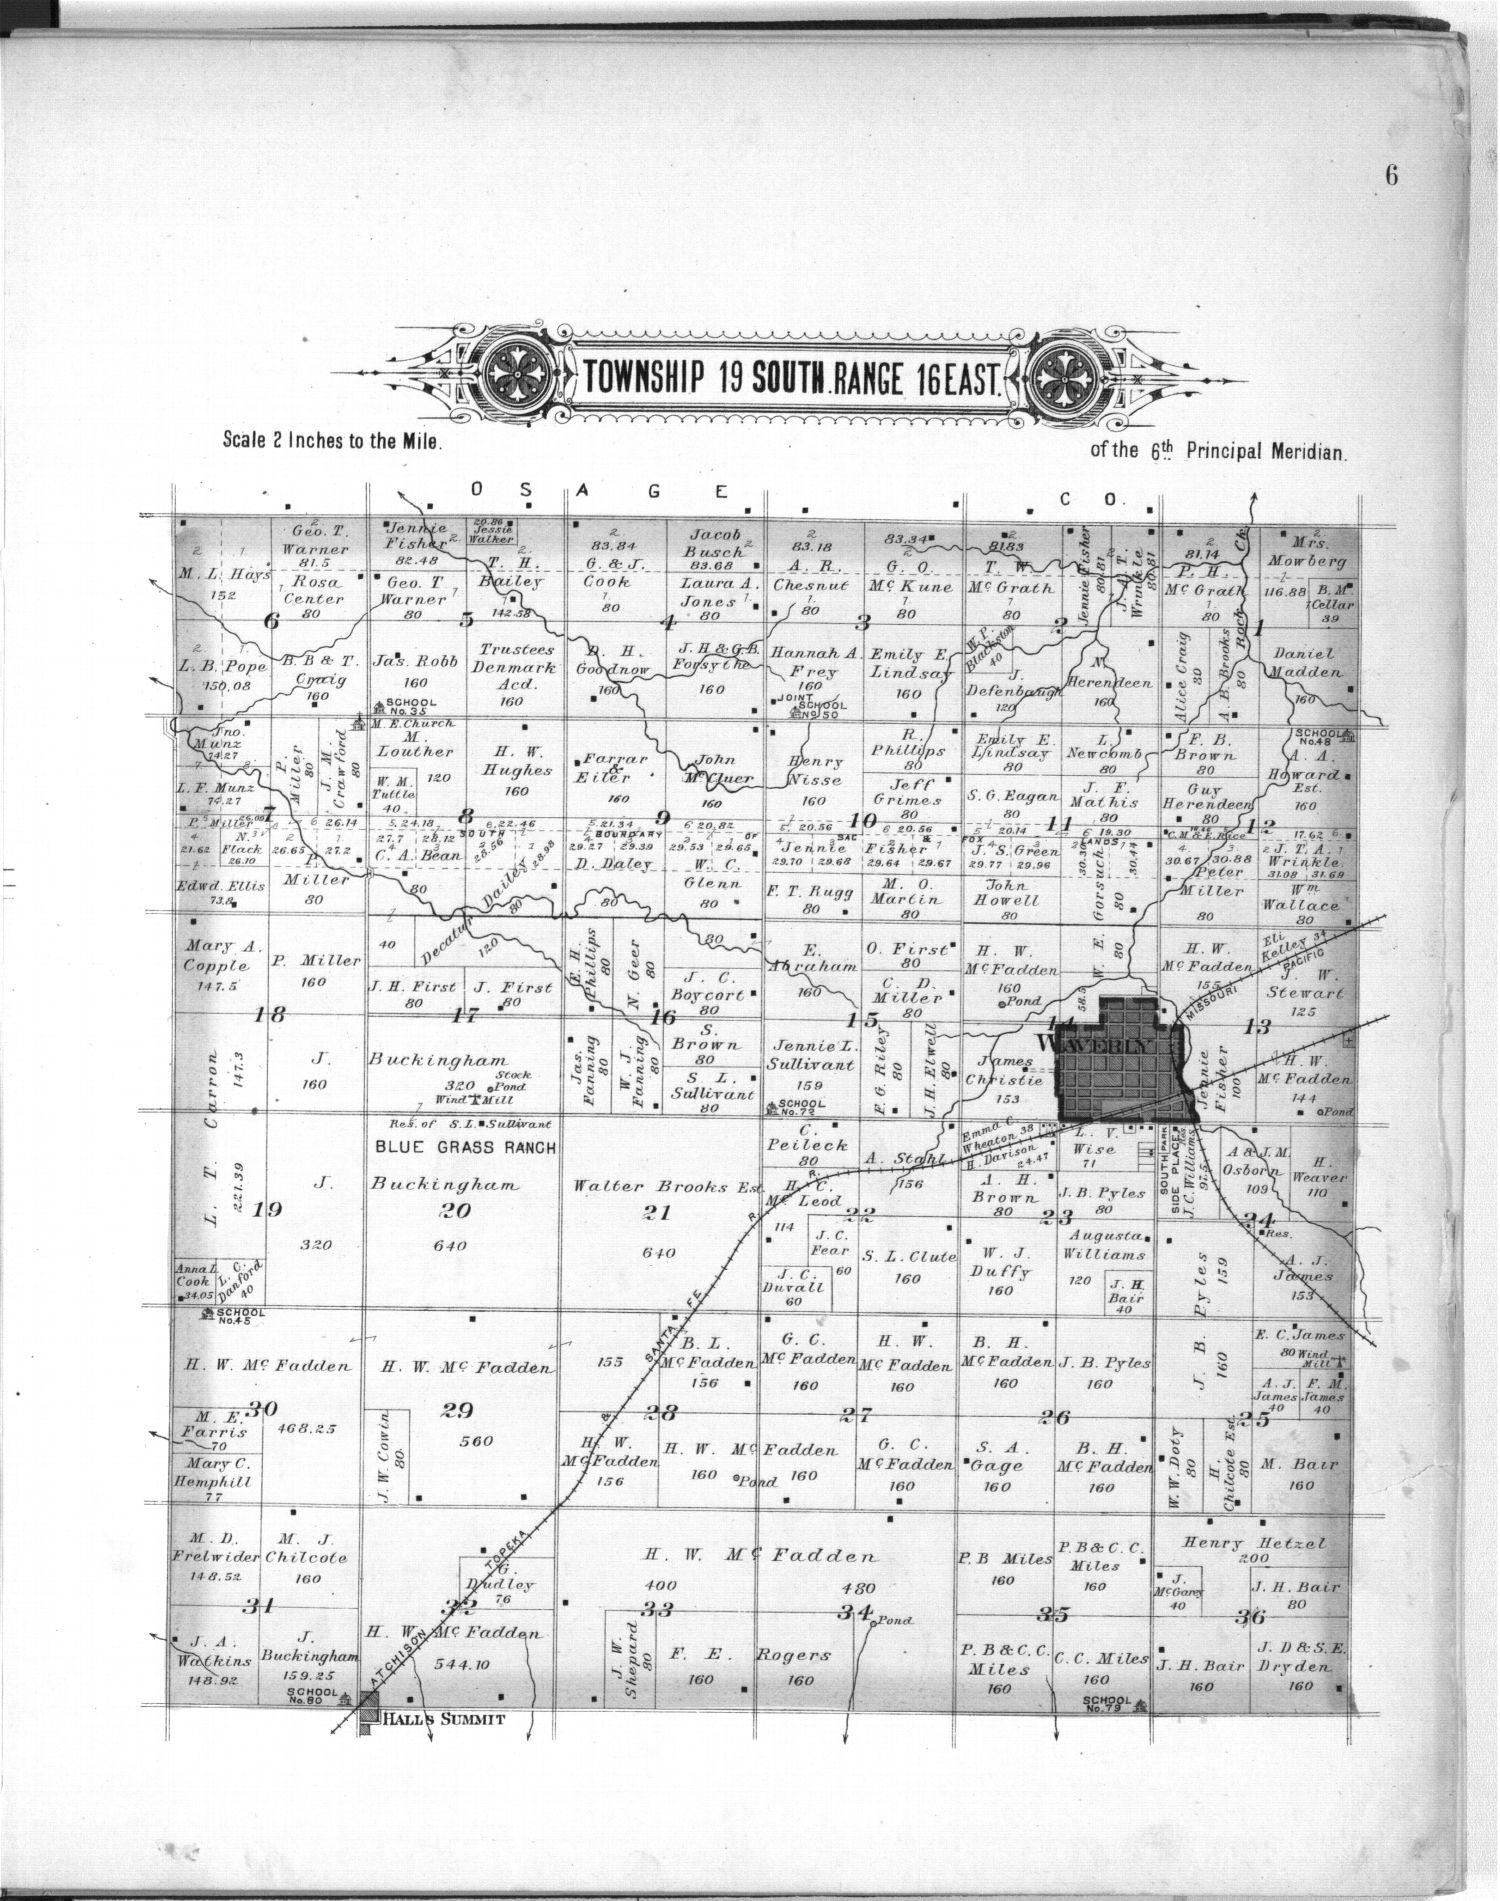 Plat book, Coffey County, Kansas - 6